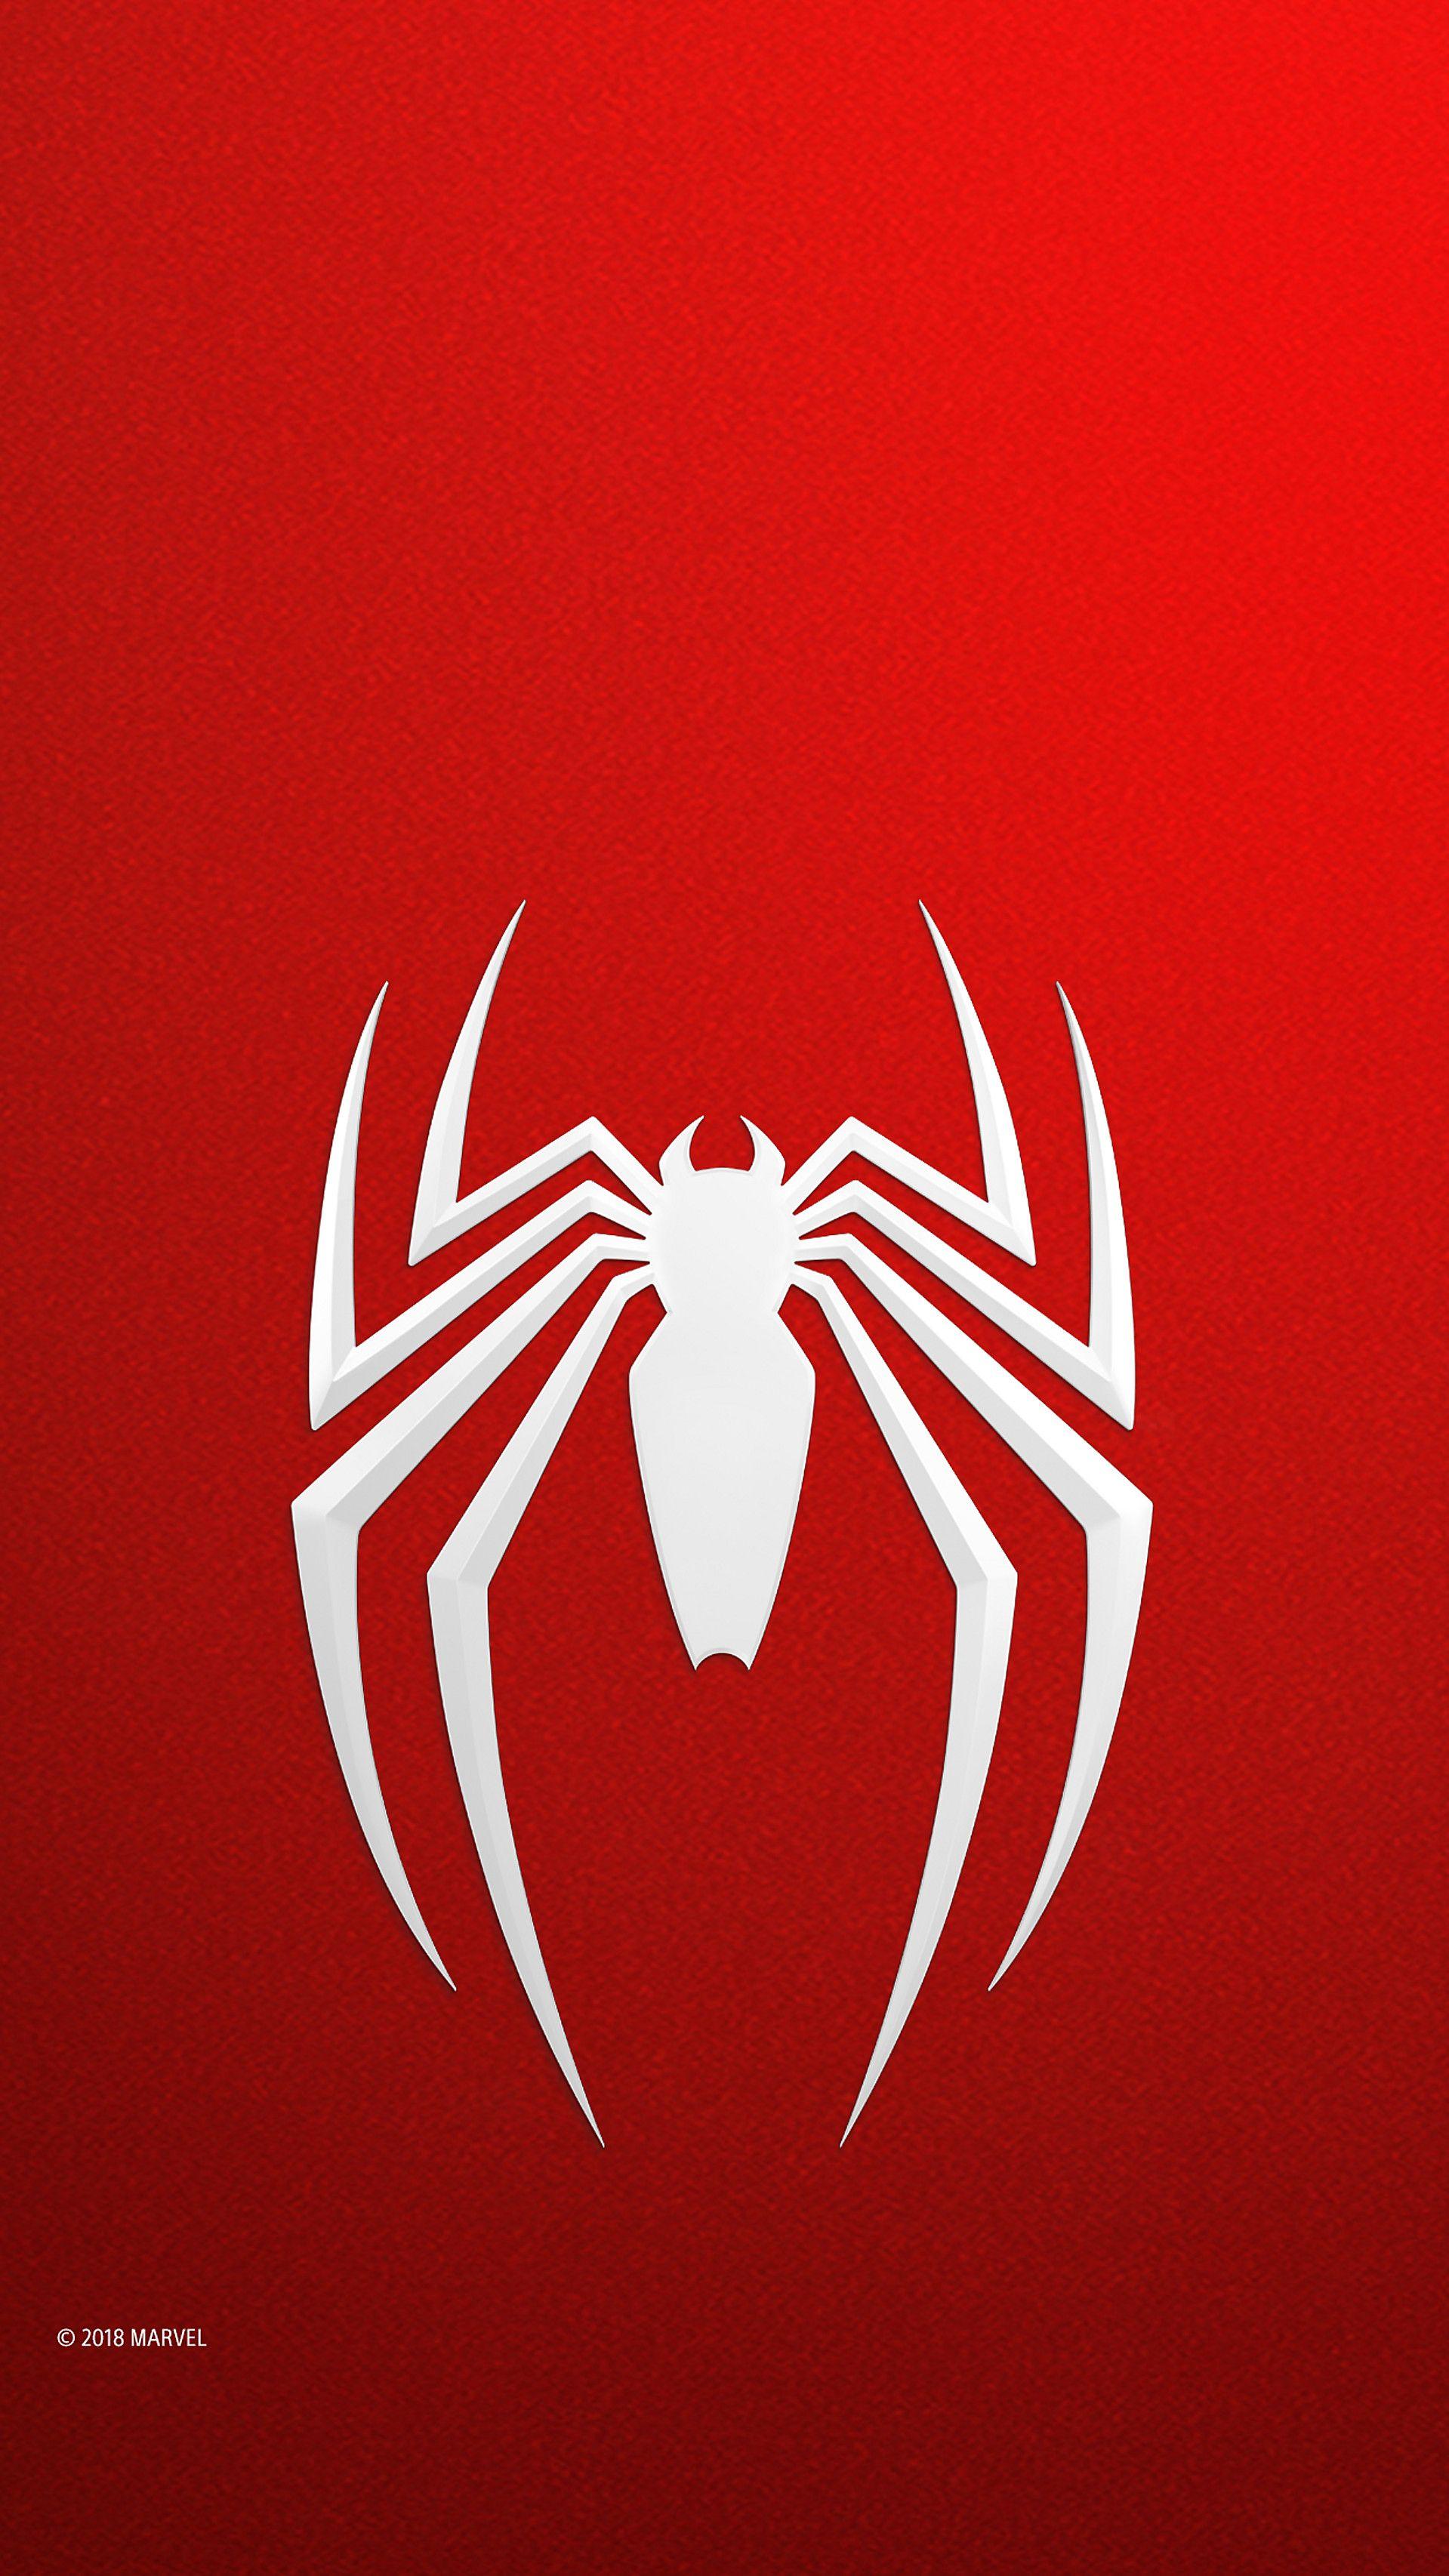 Marvel S Spider Man Game Ps4 Playstation Hombre Arana Comic